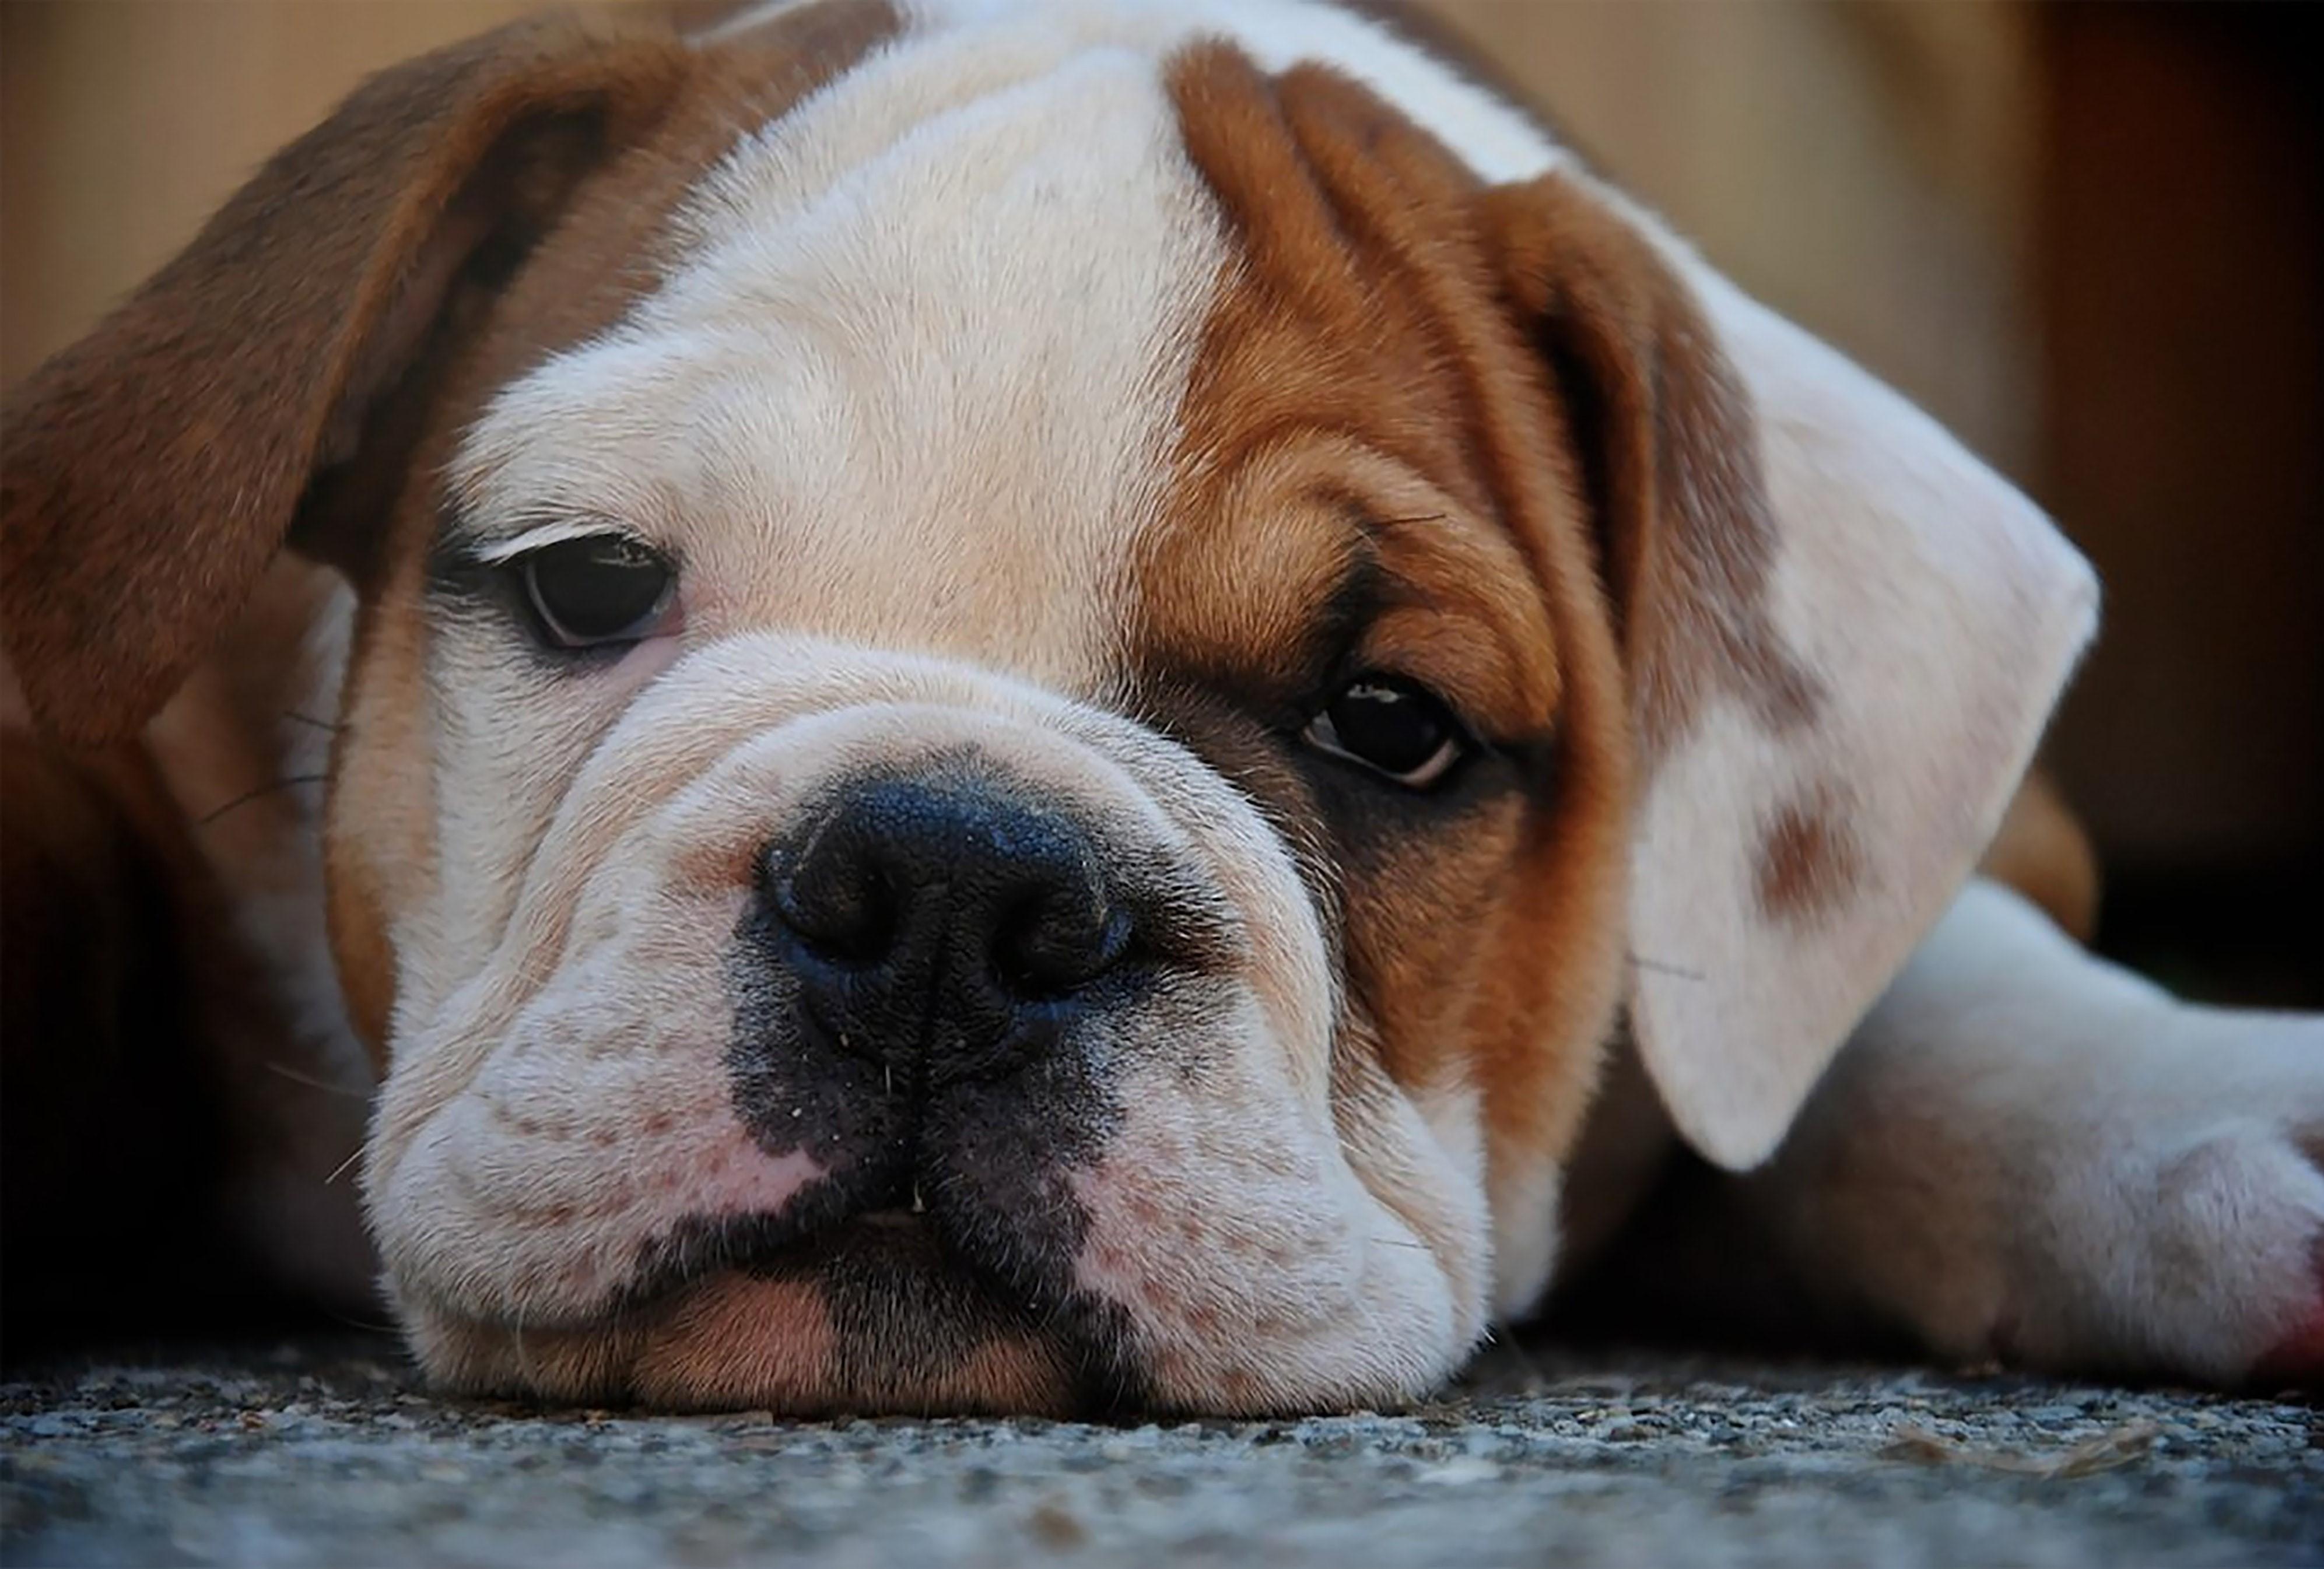 Photo of bulldog with chin on floor